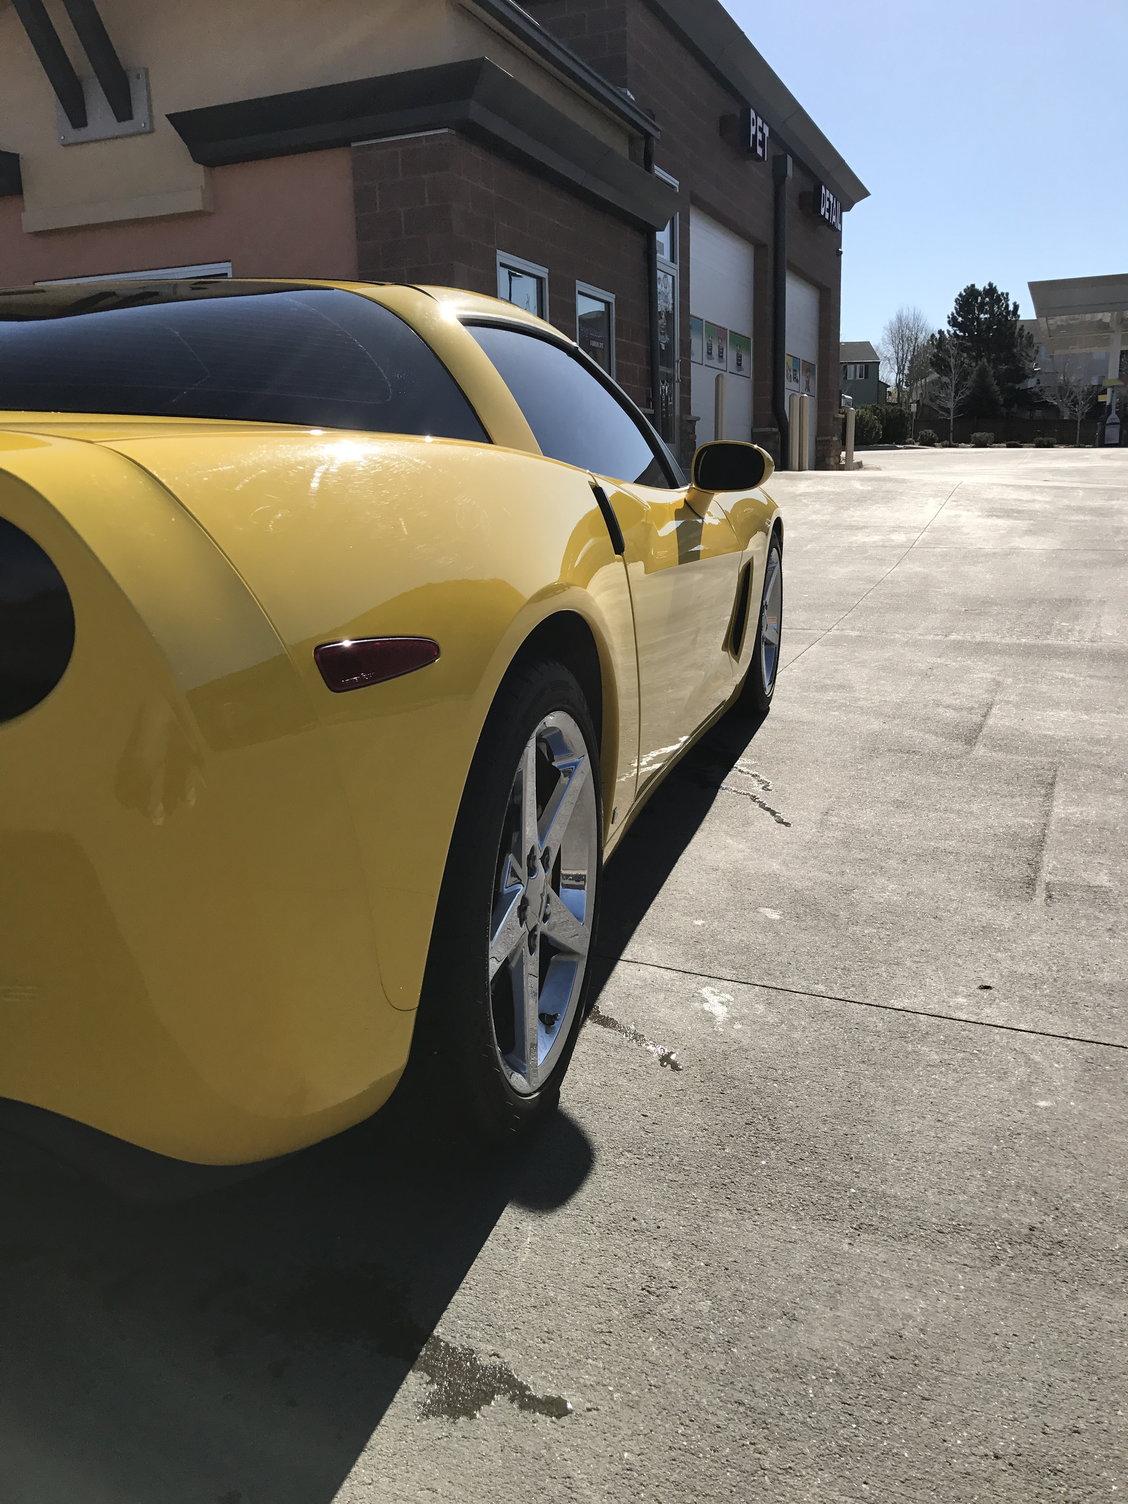 Used Corvettes For Sale Near Me >> FS (For Sale) 2007 Yellow Z51 M6 - CorvetteForum ...